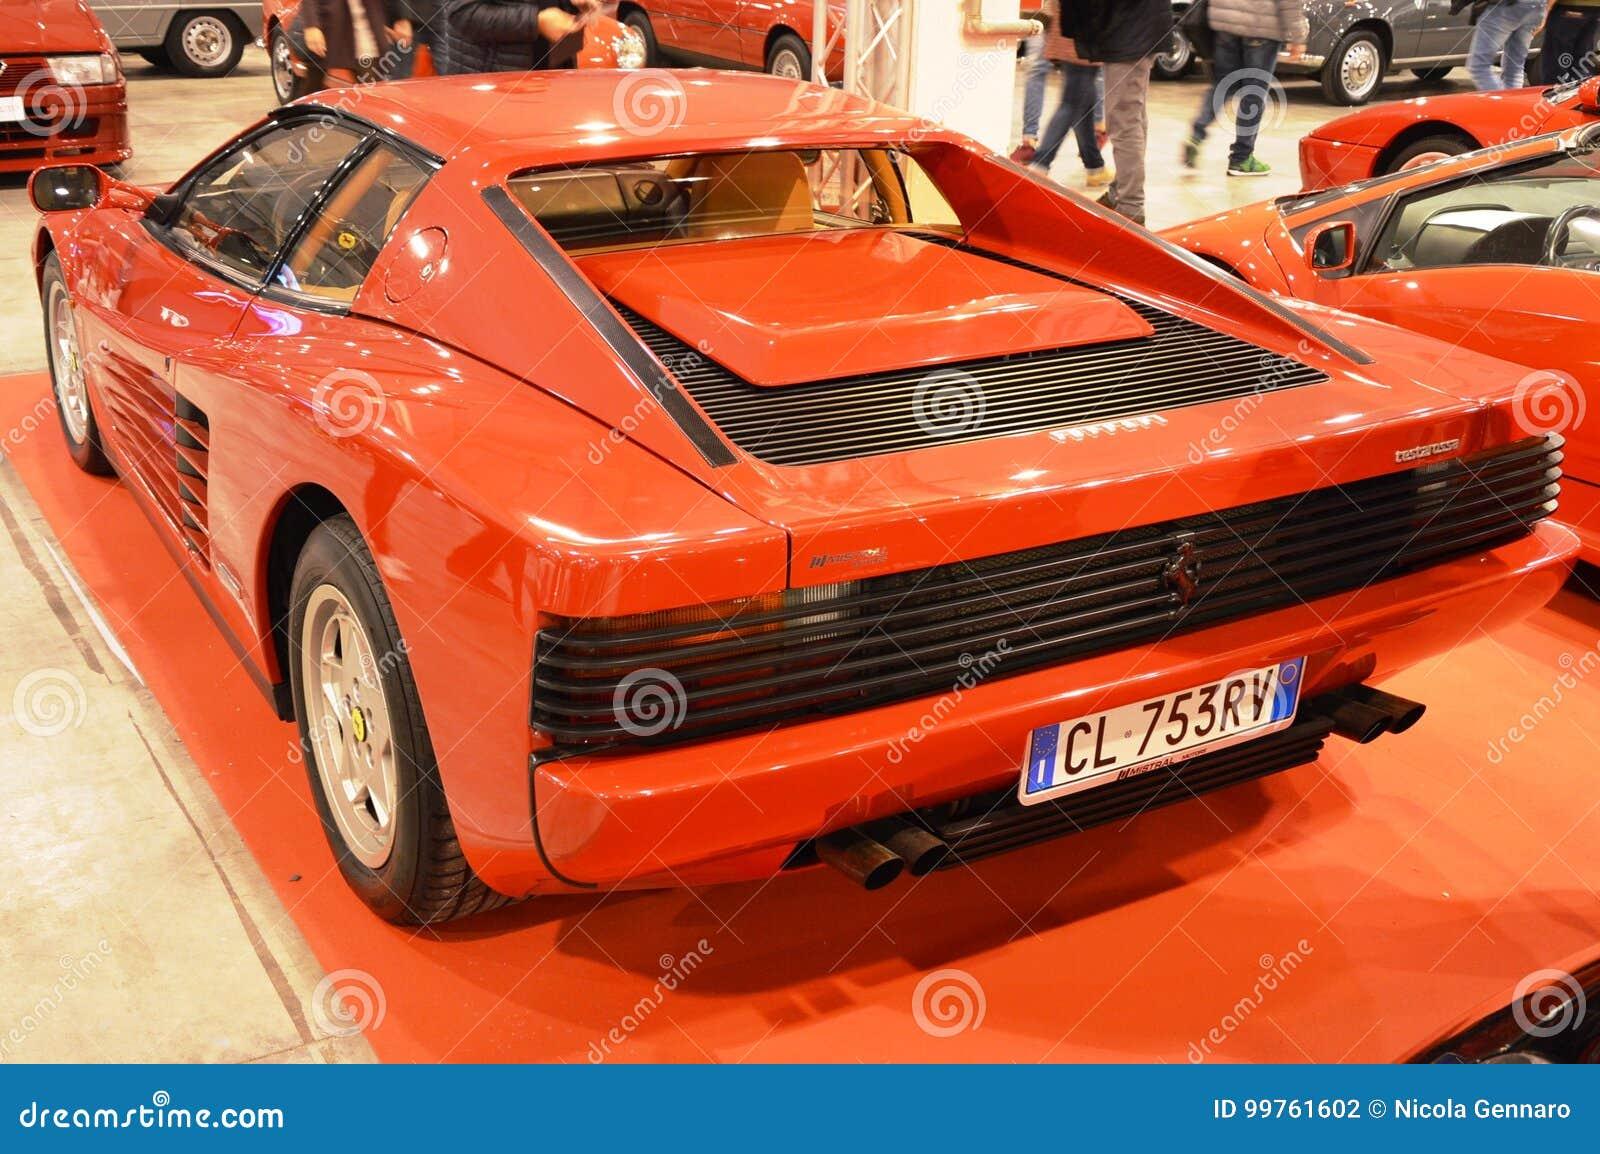 Ferrari Testarossa At Vintage Car Exposition In Padova 2015 Editorial Photography Image Of Vintage Ferrari 99761602